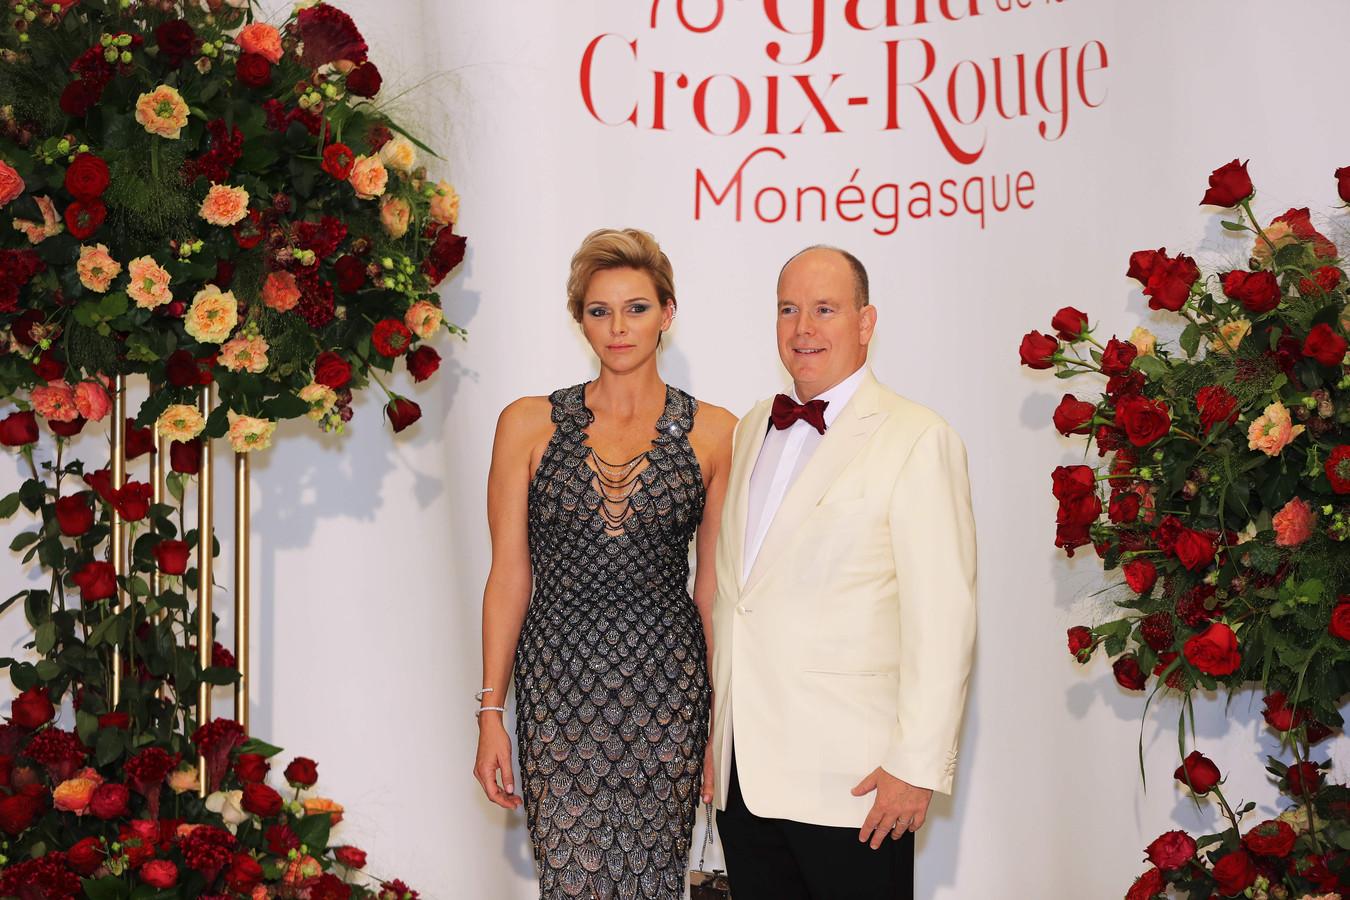 Prince Albert II de Monaco et Charlene